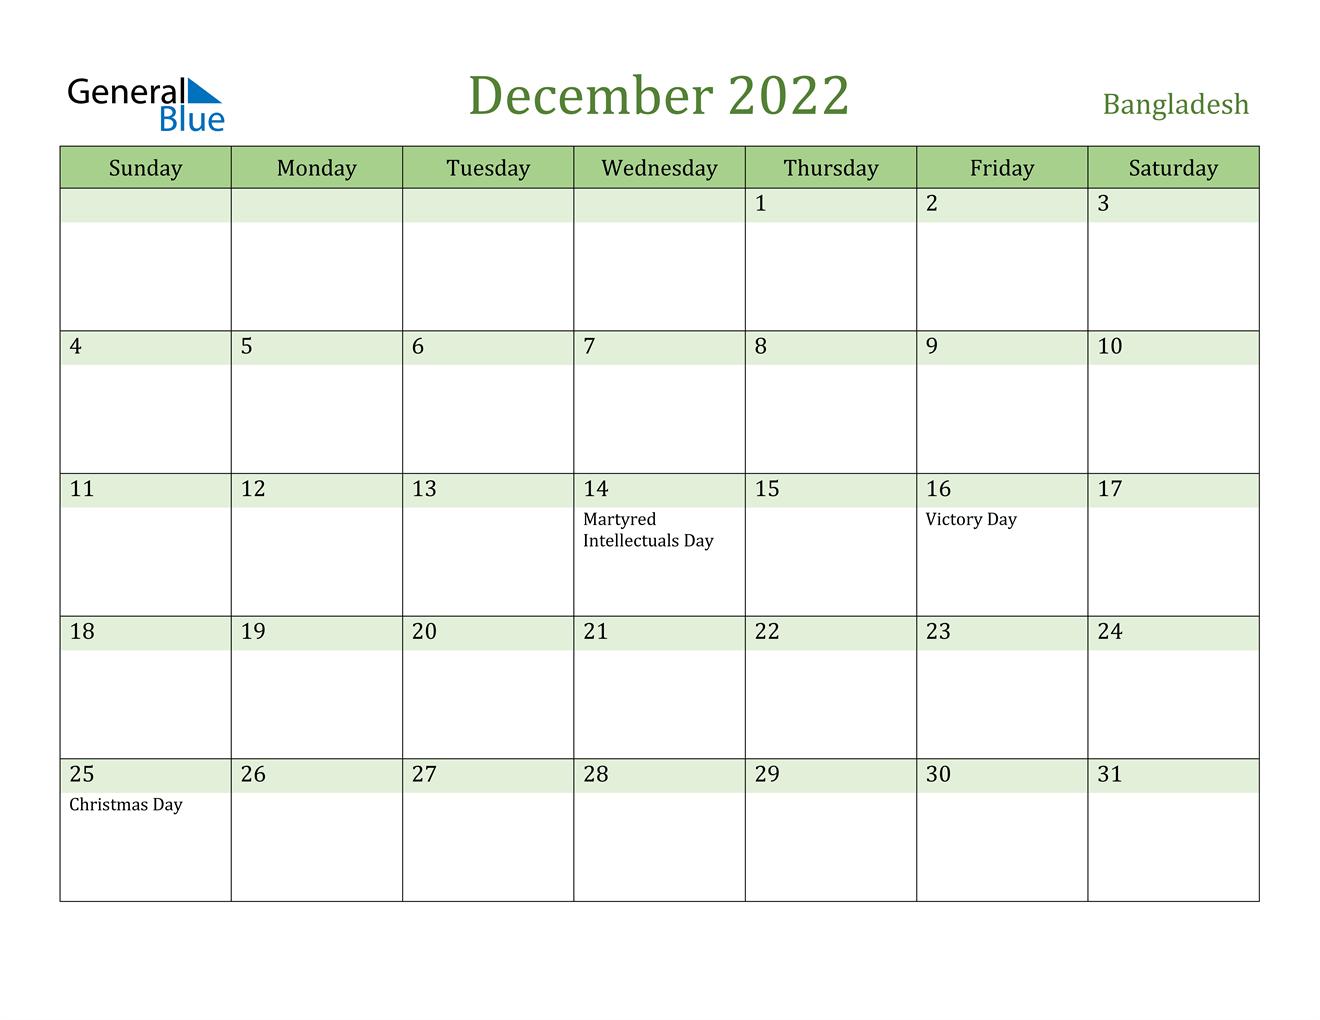 December 2022 Calendar - Bangladesh